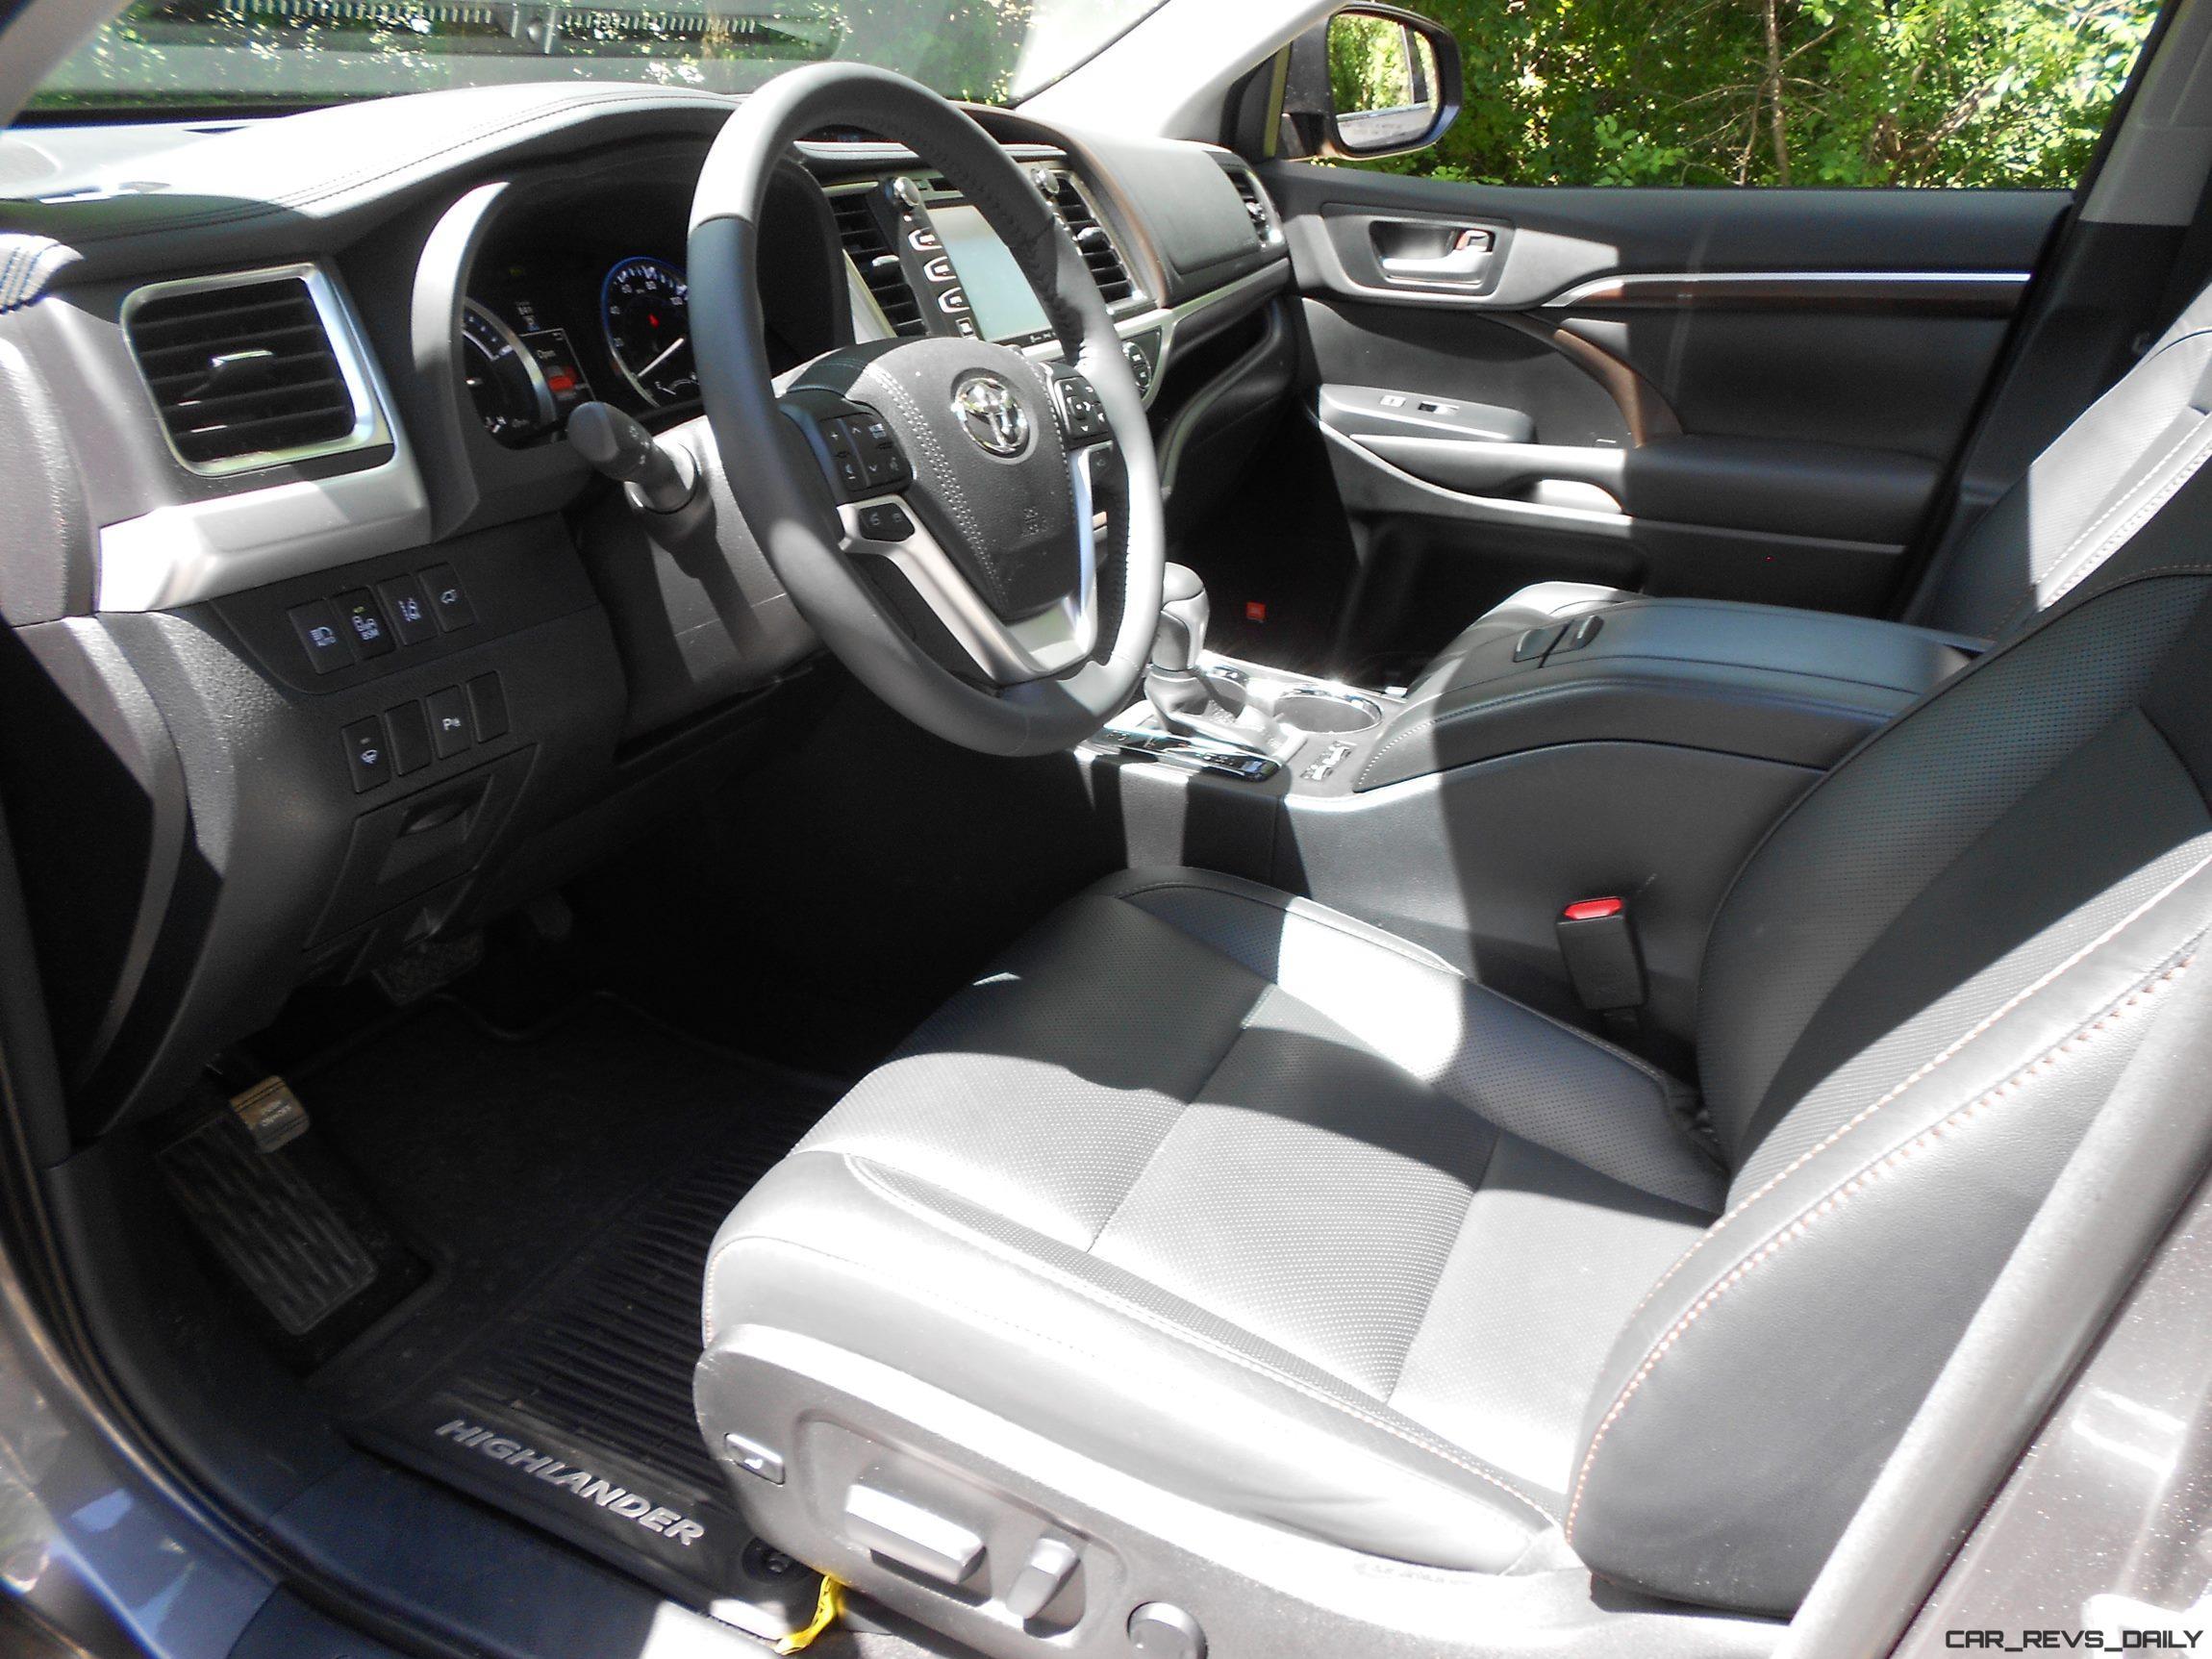 2016 highlander hybrid interior 6 - Toyota highlander hybrid interior ...